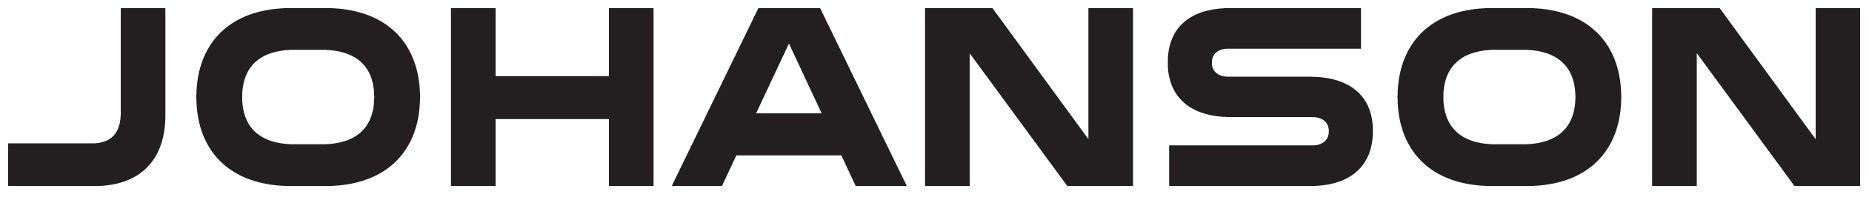 Johanson_logo